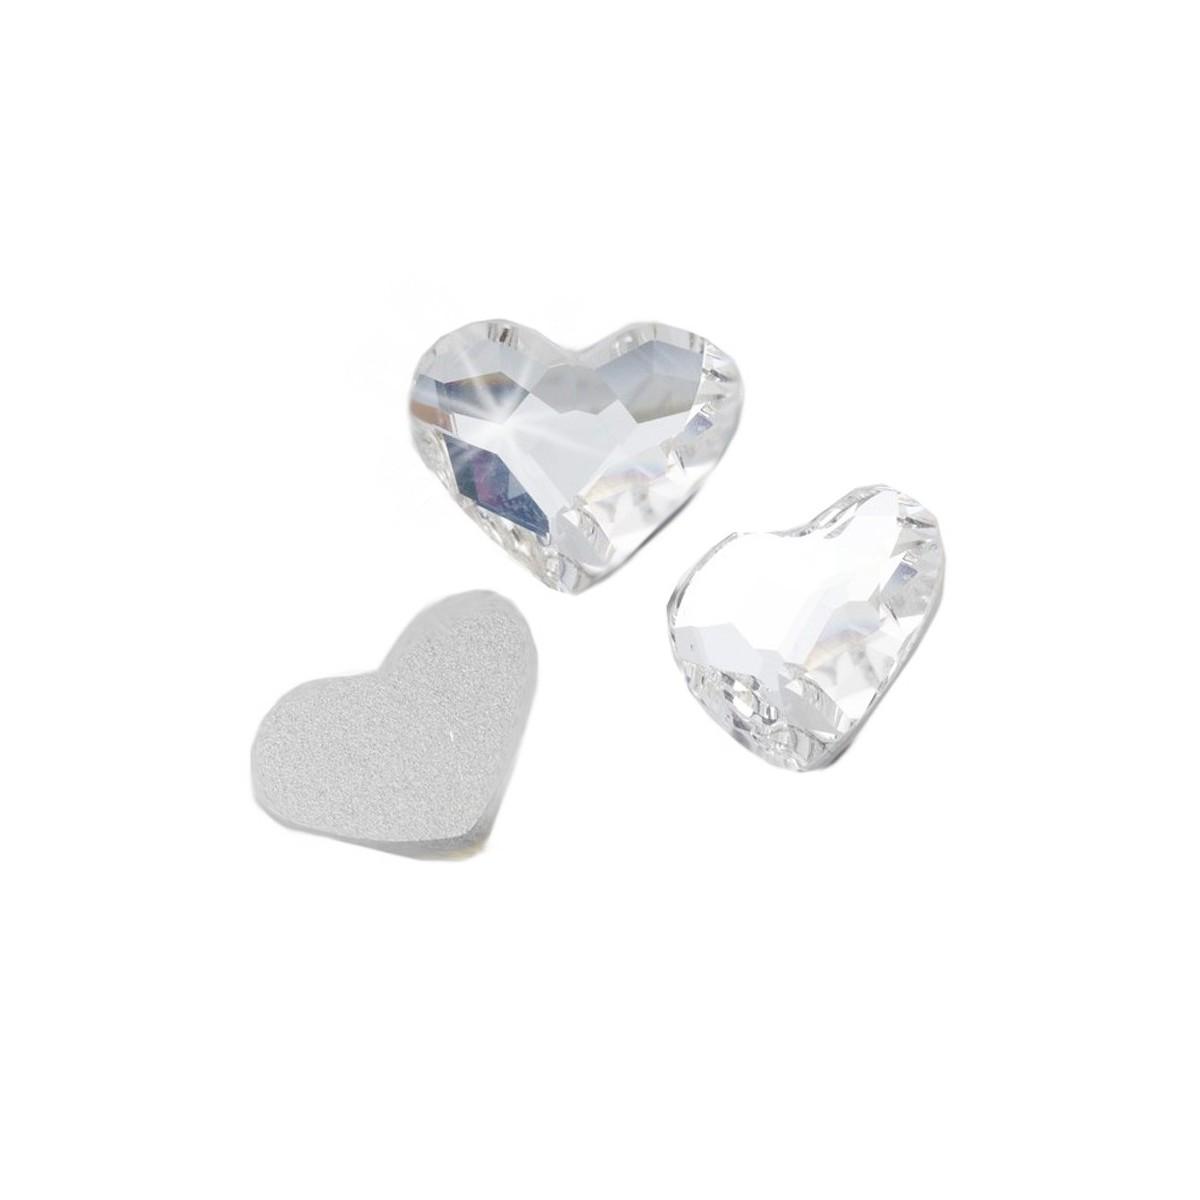 50 cristaux de swarovski à fond plat thermocollant